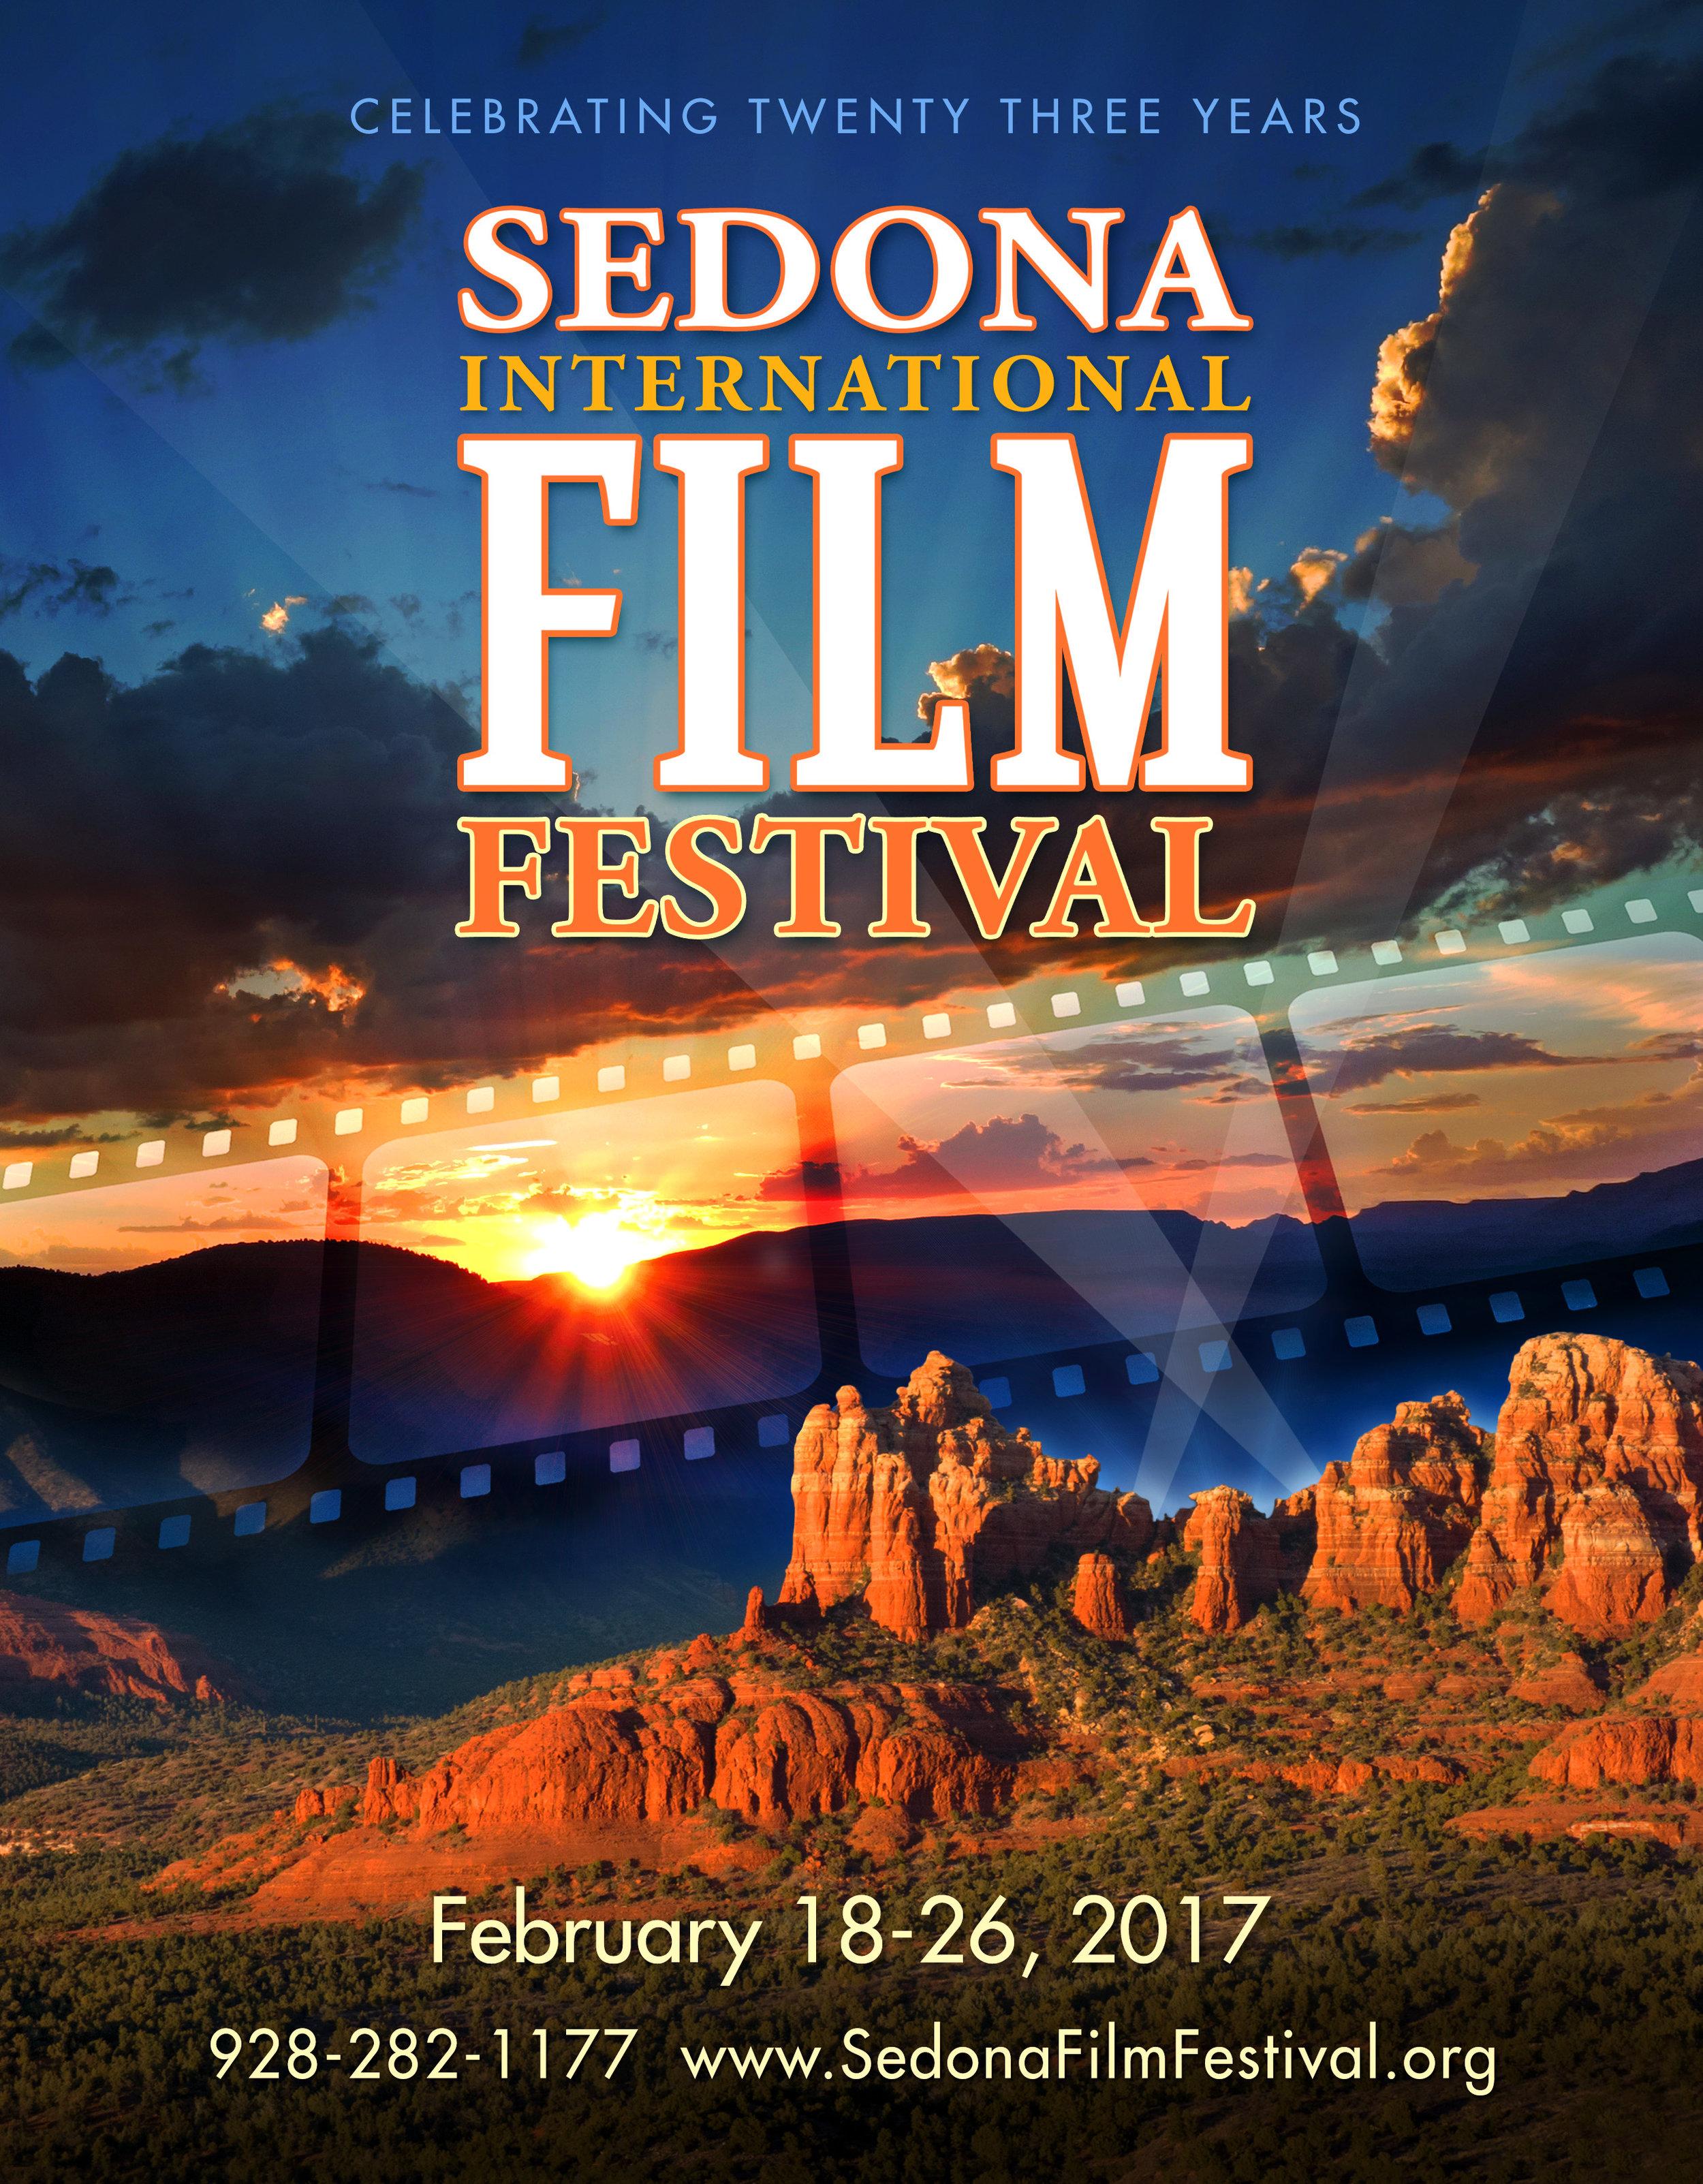 Sedona Film Fest 2017